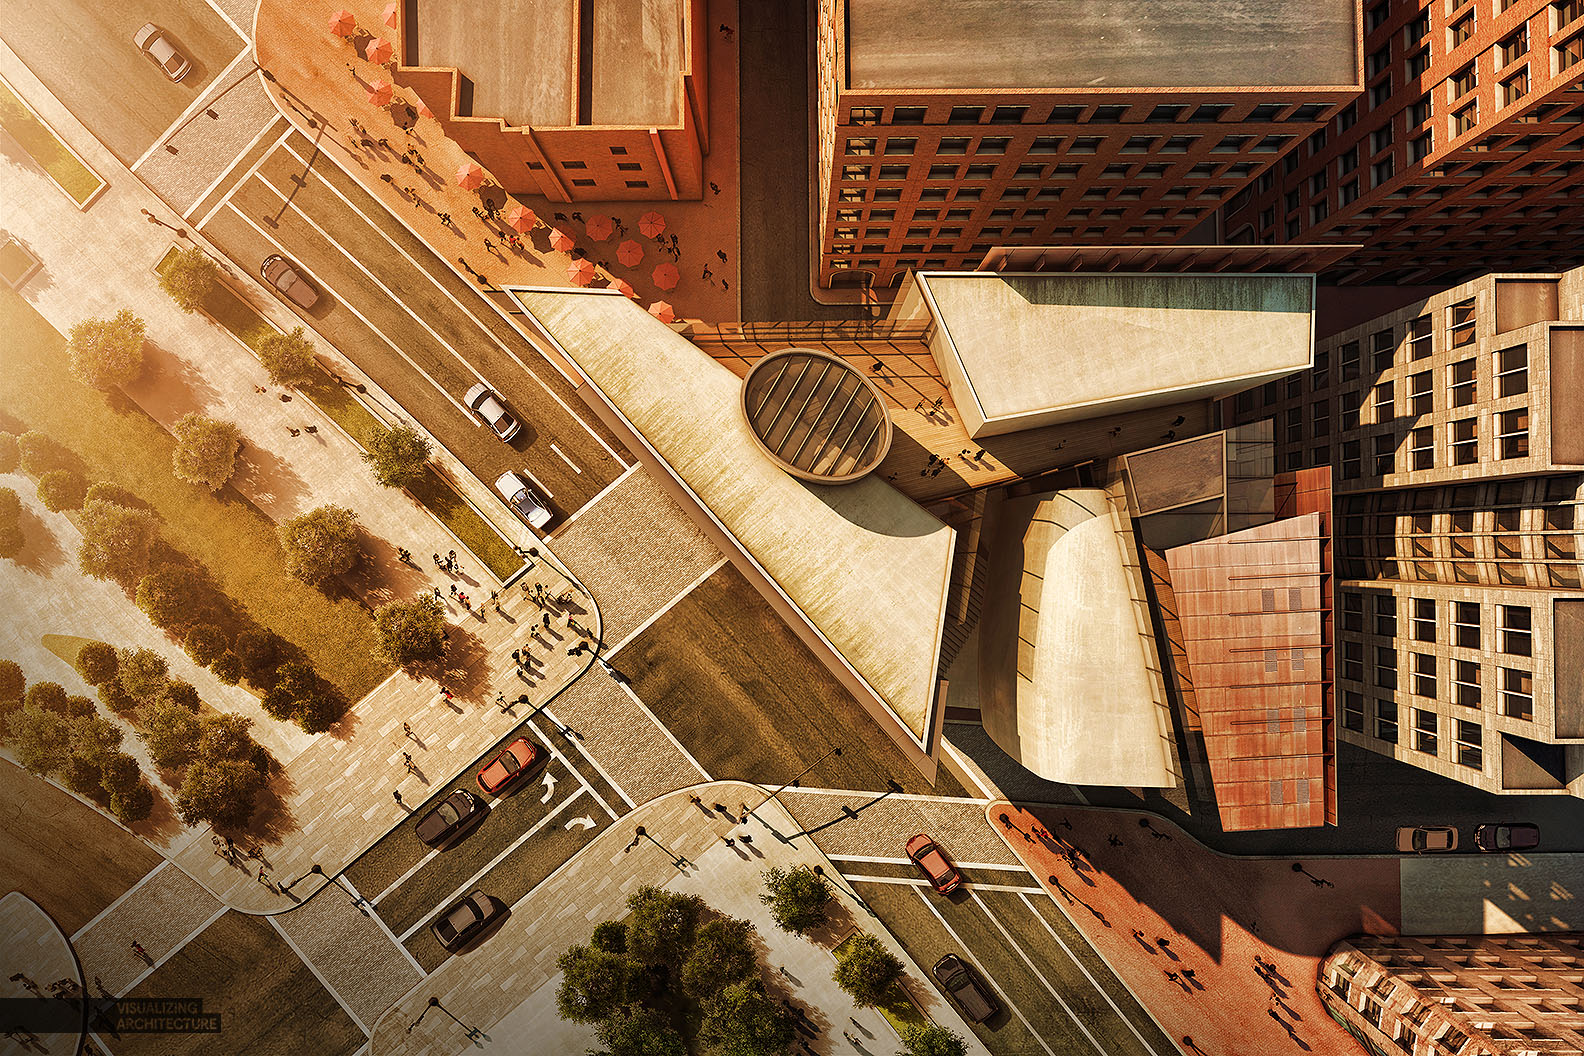 BC_Aerial_5_final_boston_aerial_illustration